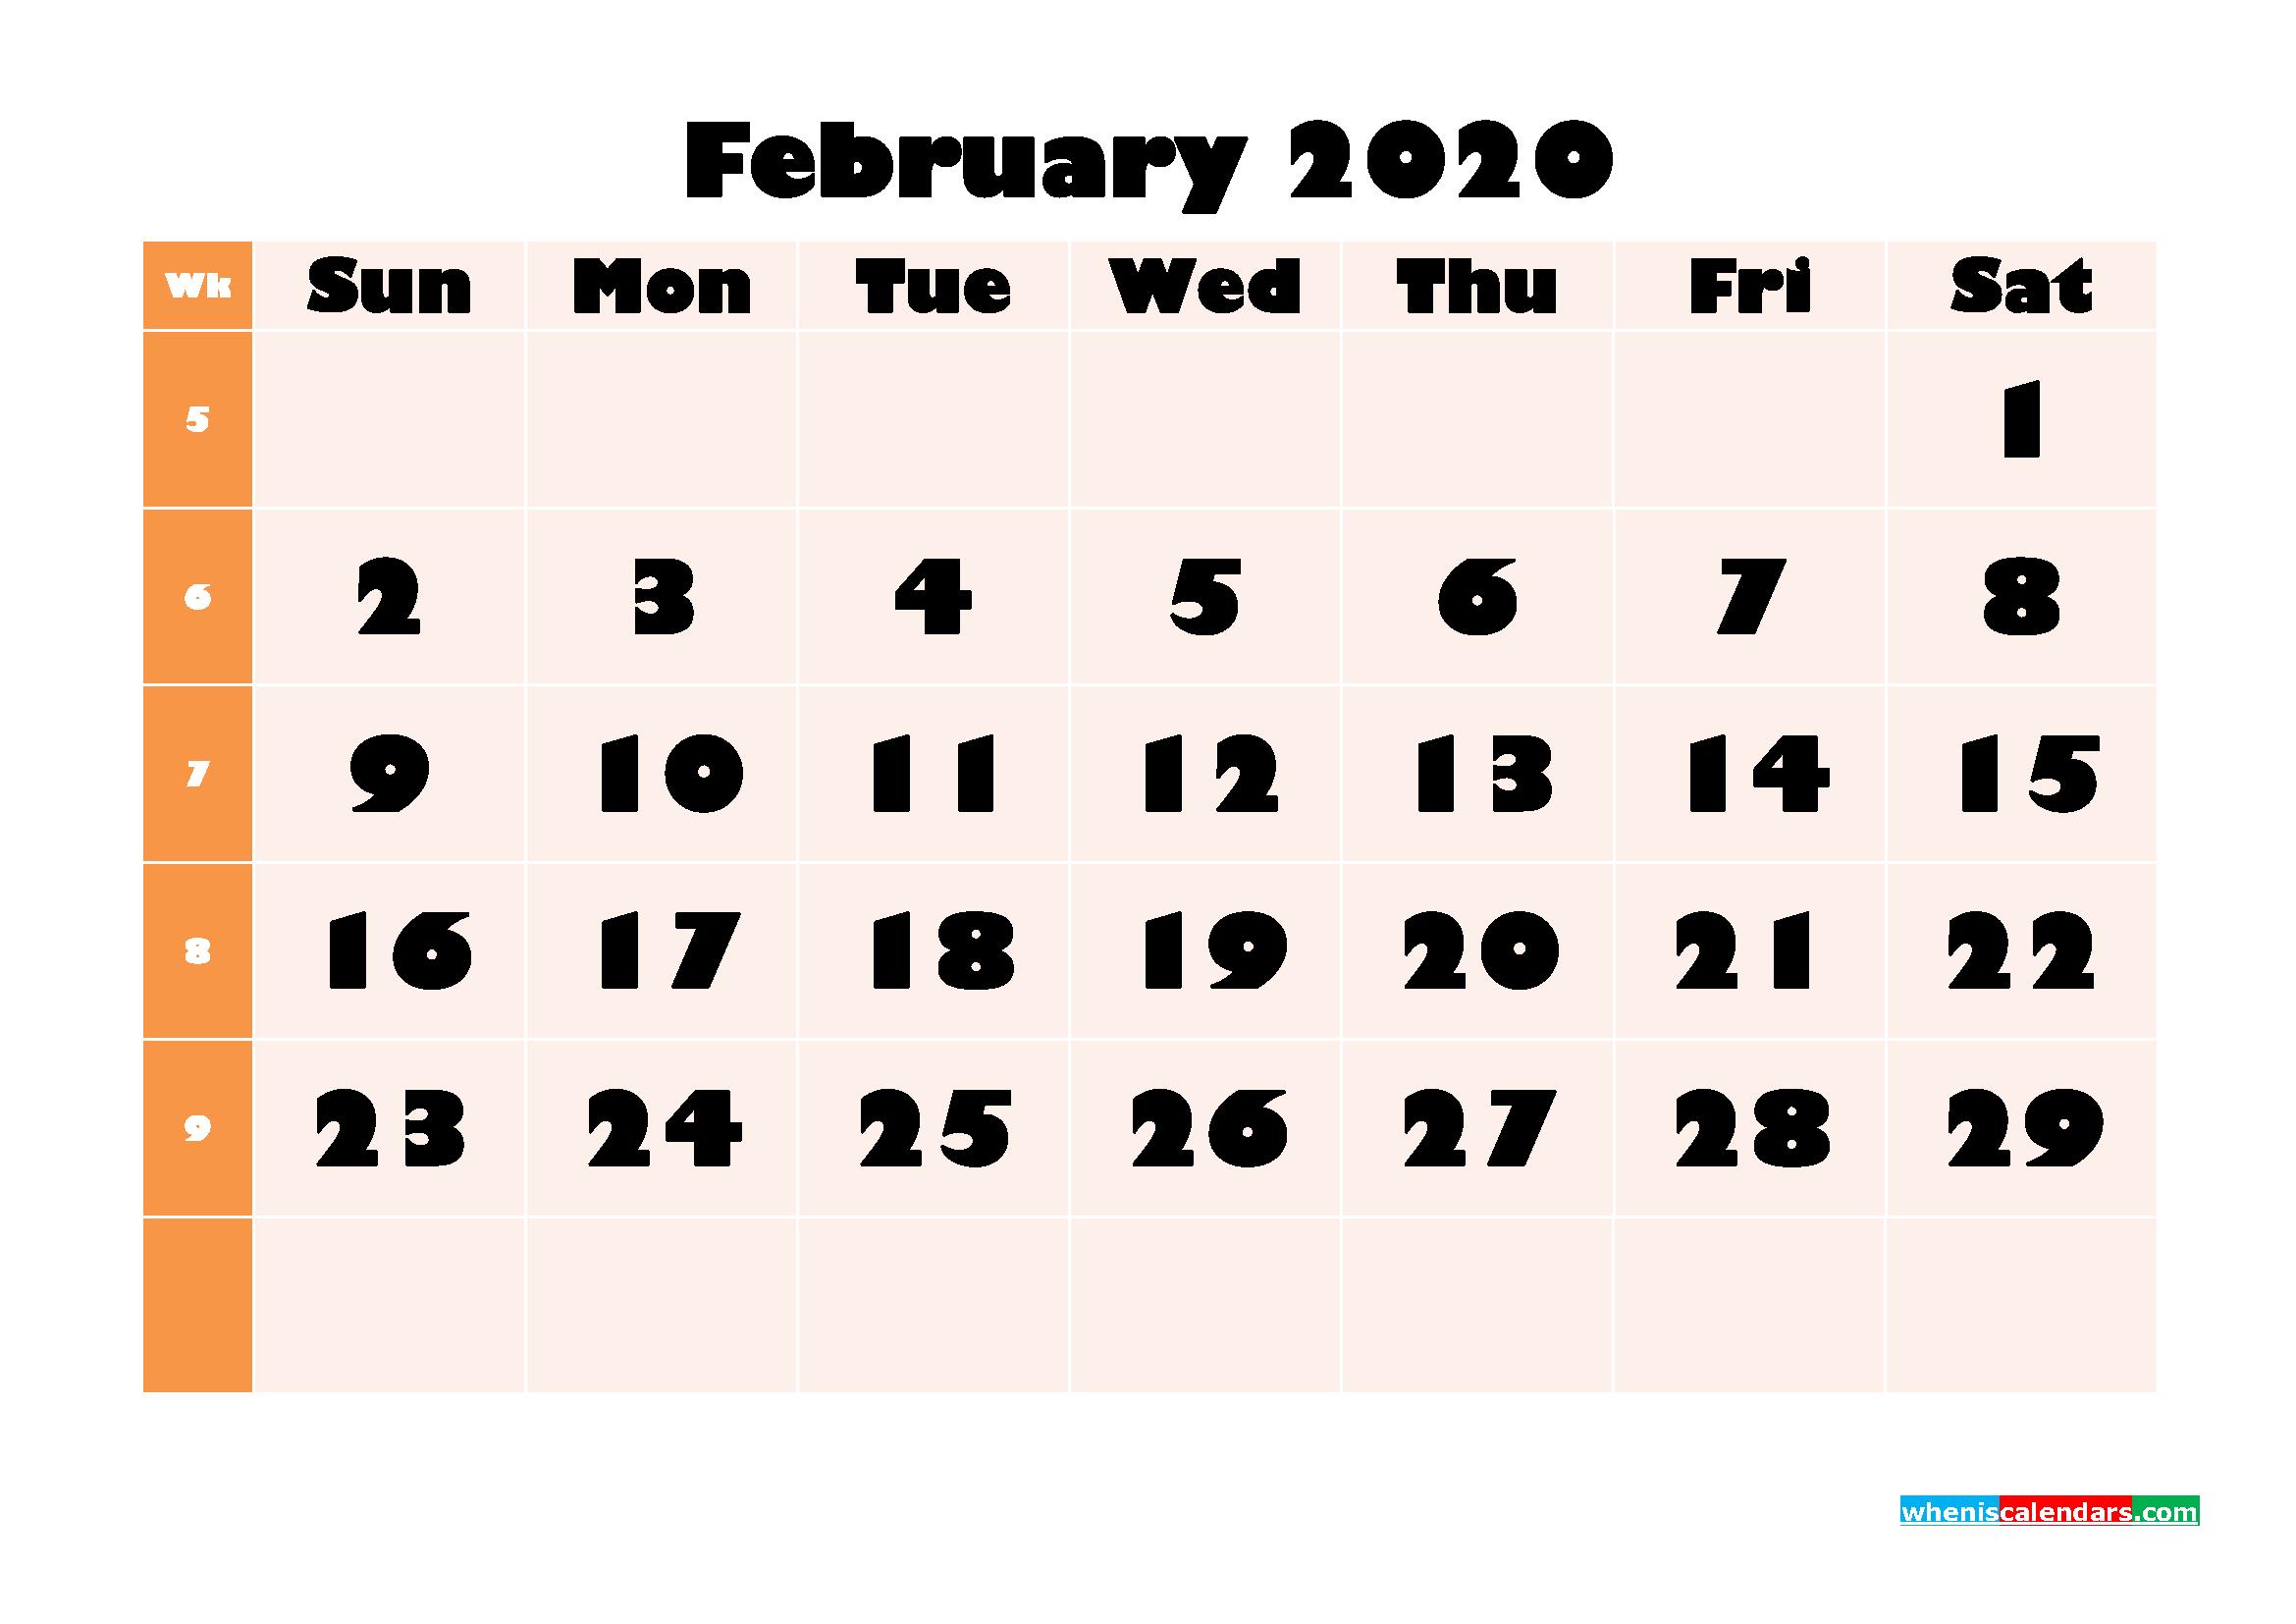 Blank February 2020 Calendar Printable - No.m20b698